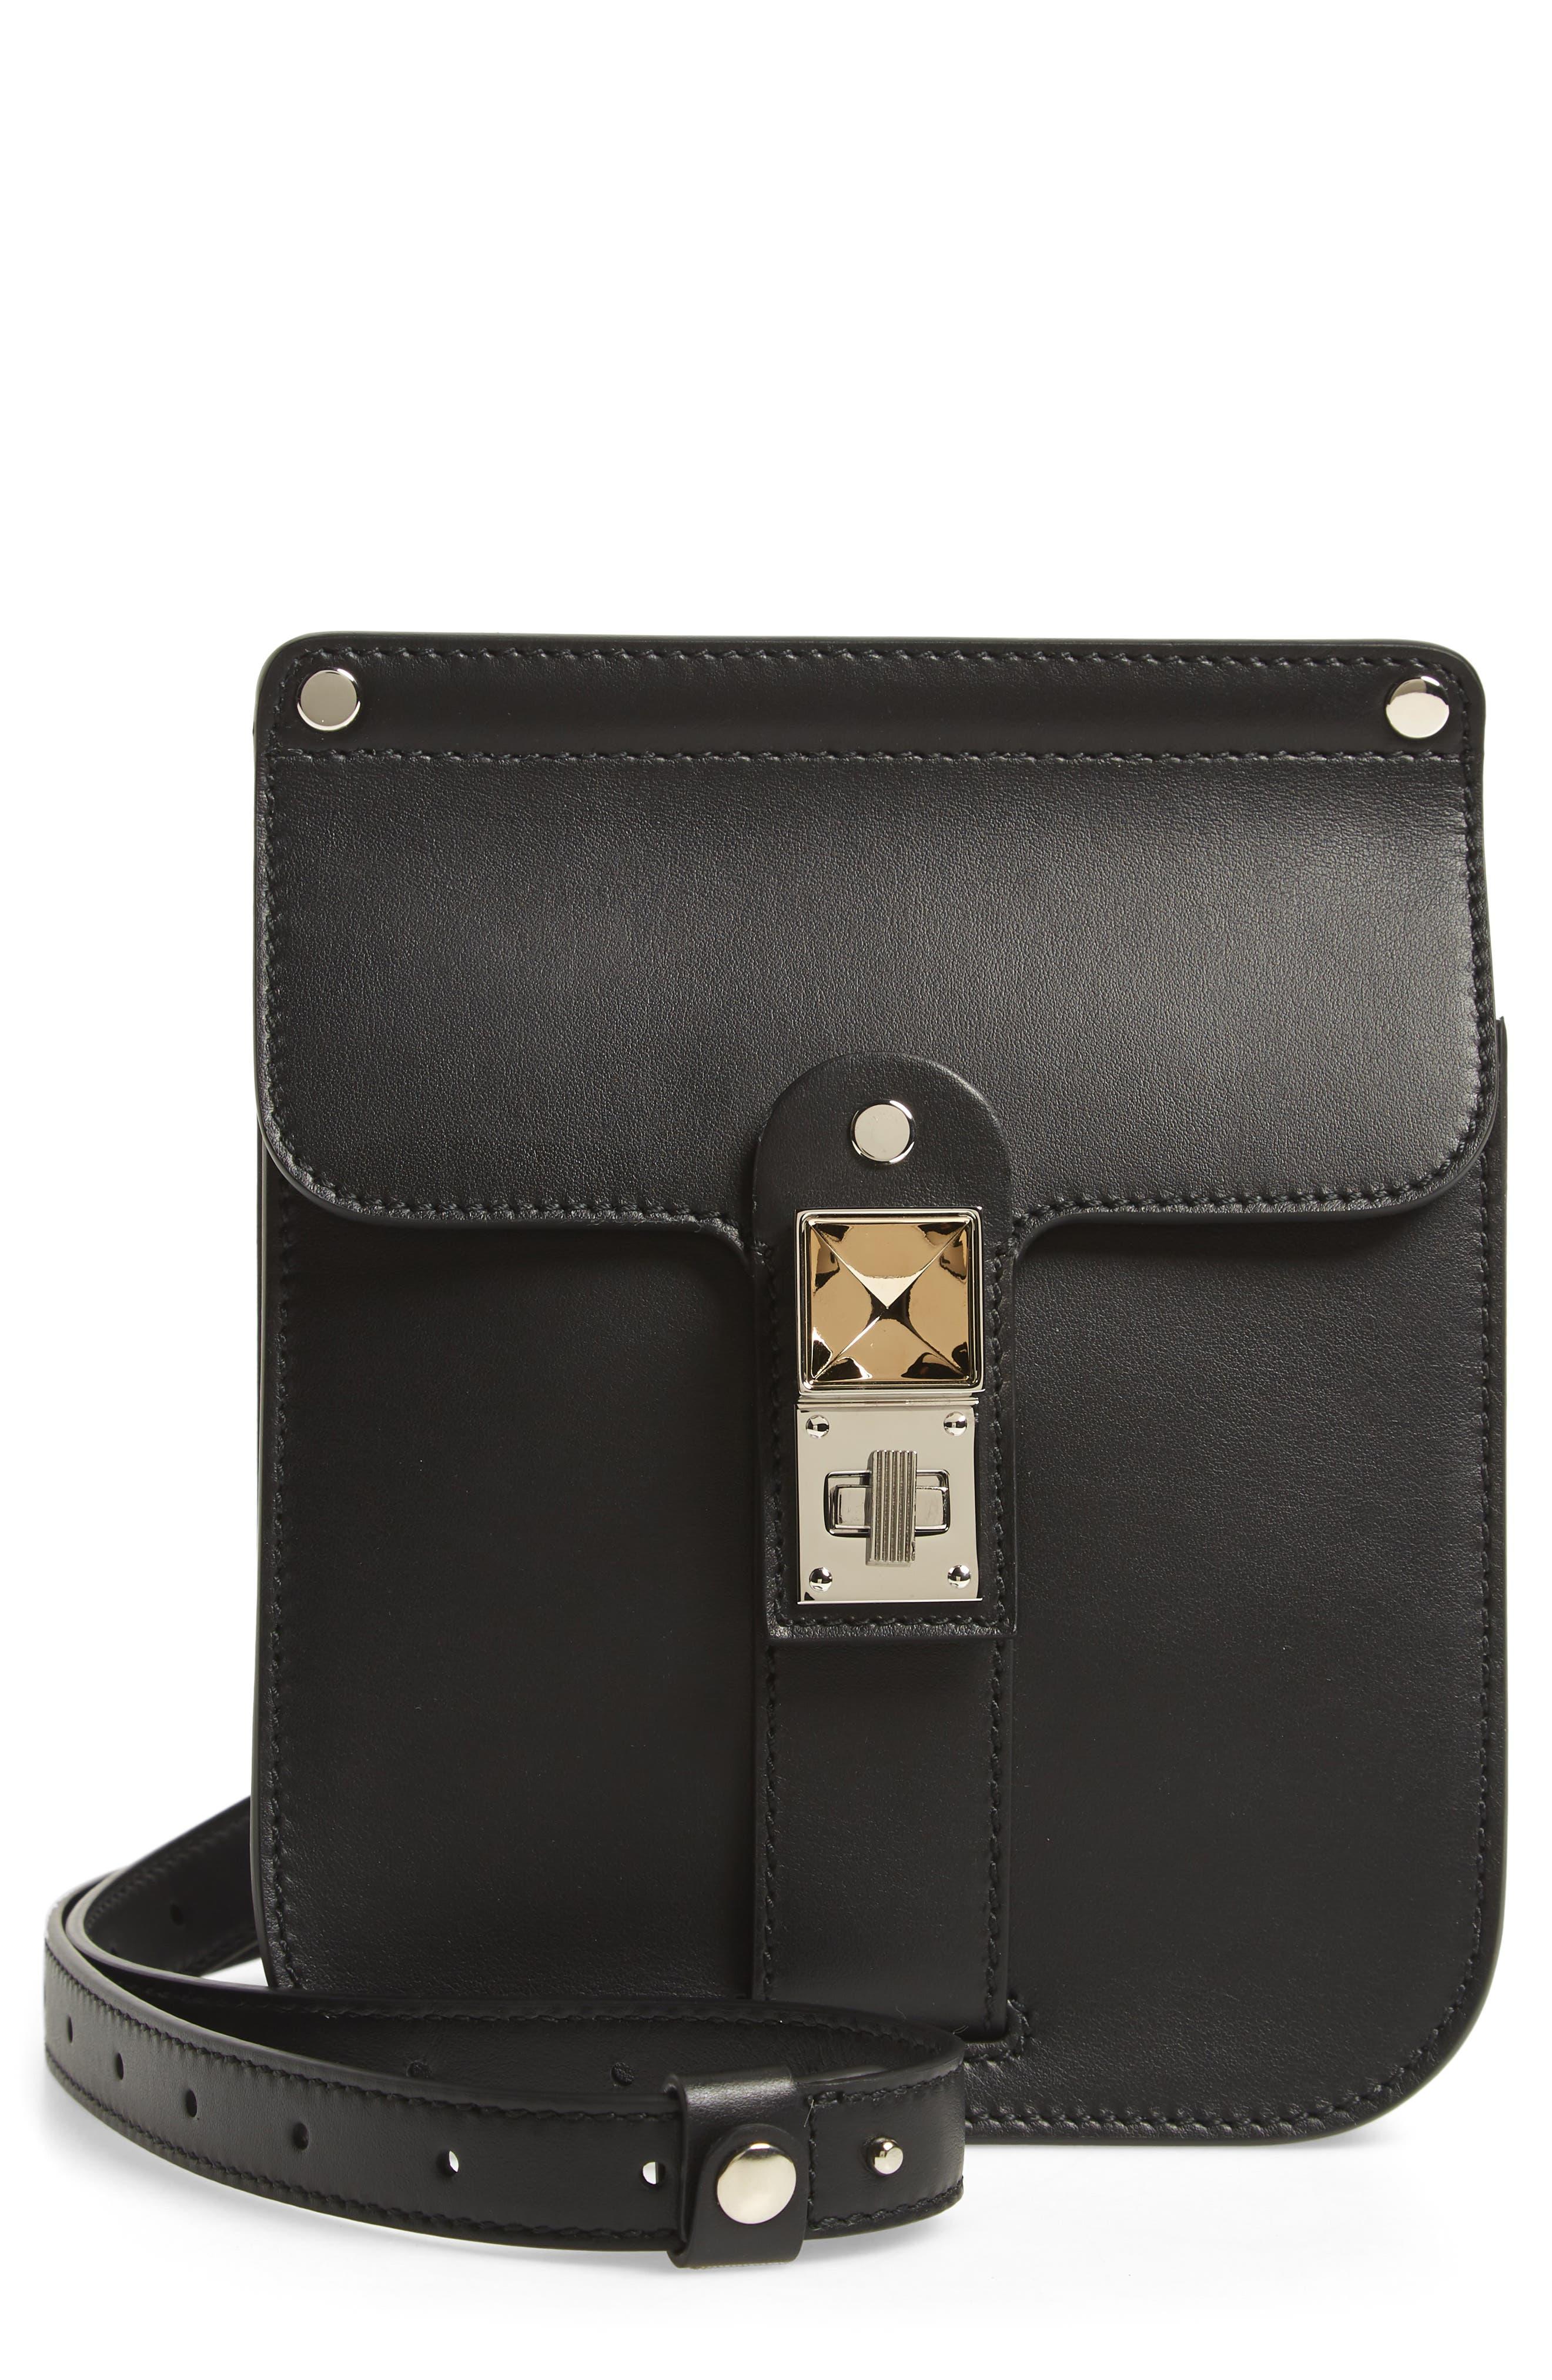 PROENZA SCHOULER, PS11 Box Leather Crossbody Bag, Main thumbnail 1, color, BLACK